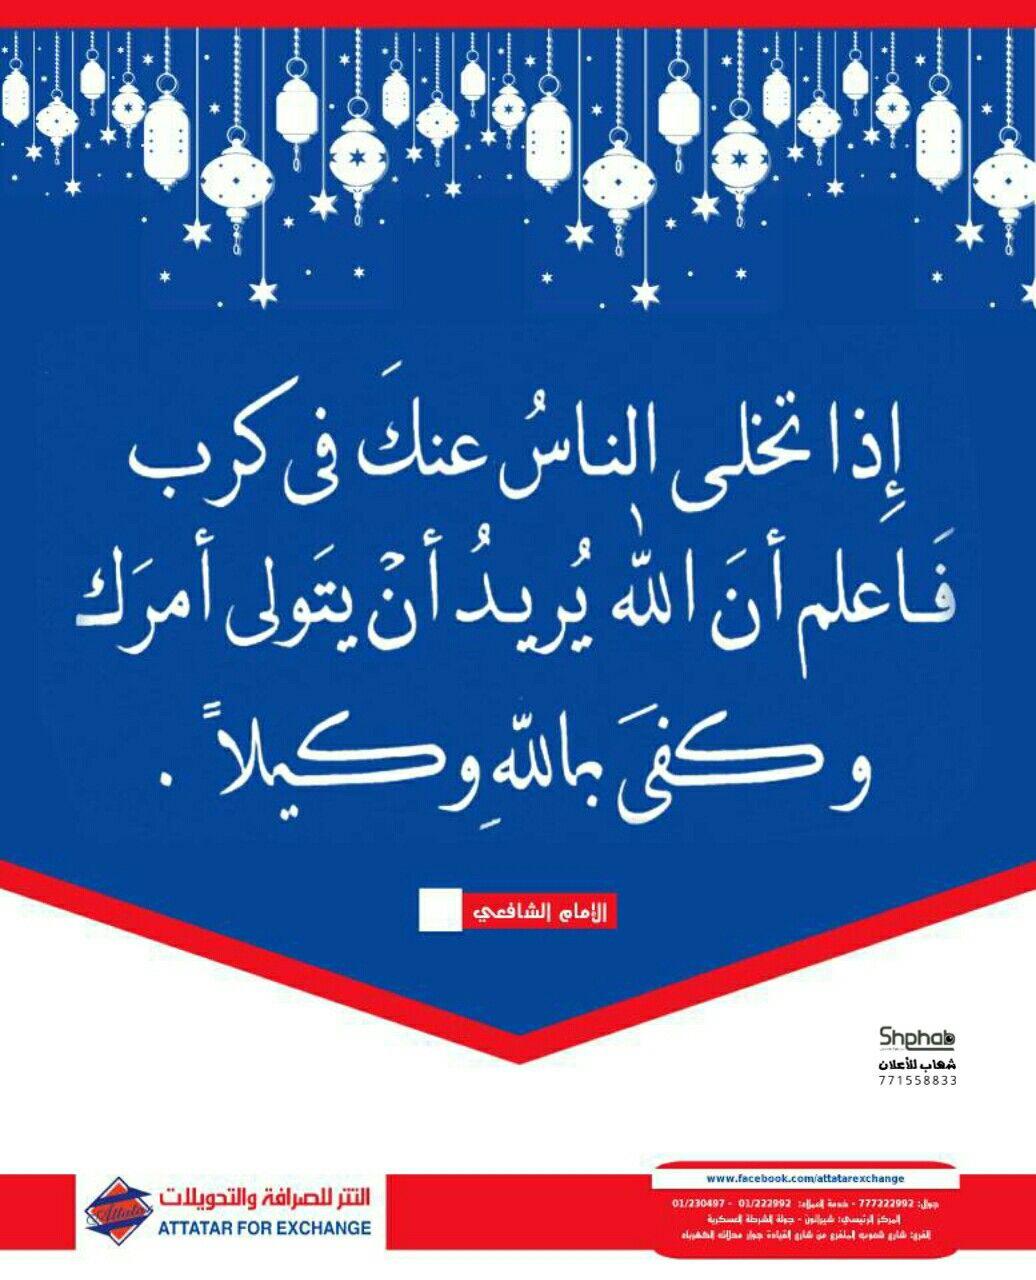 كفى بالله وكيلا Calligraphy Arabic Calligraphy